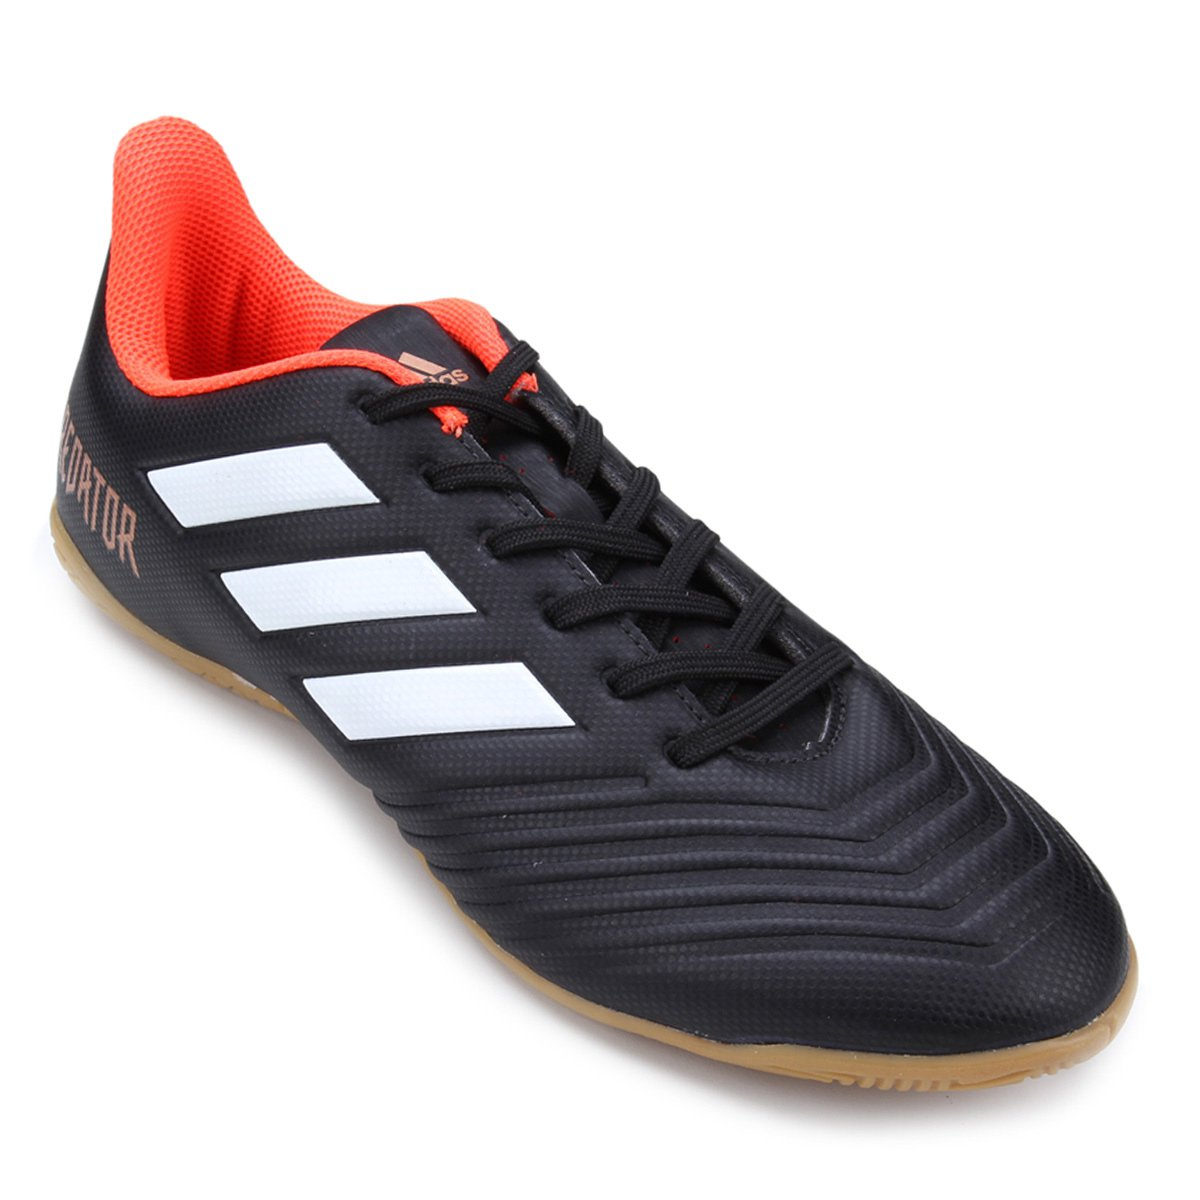 58e49b3931 Chuteira Futsal Adidas Predator 18 4 IN - Preto - Compre Agora